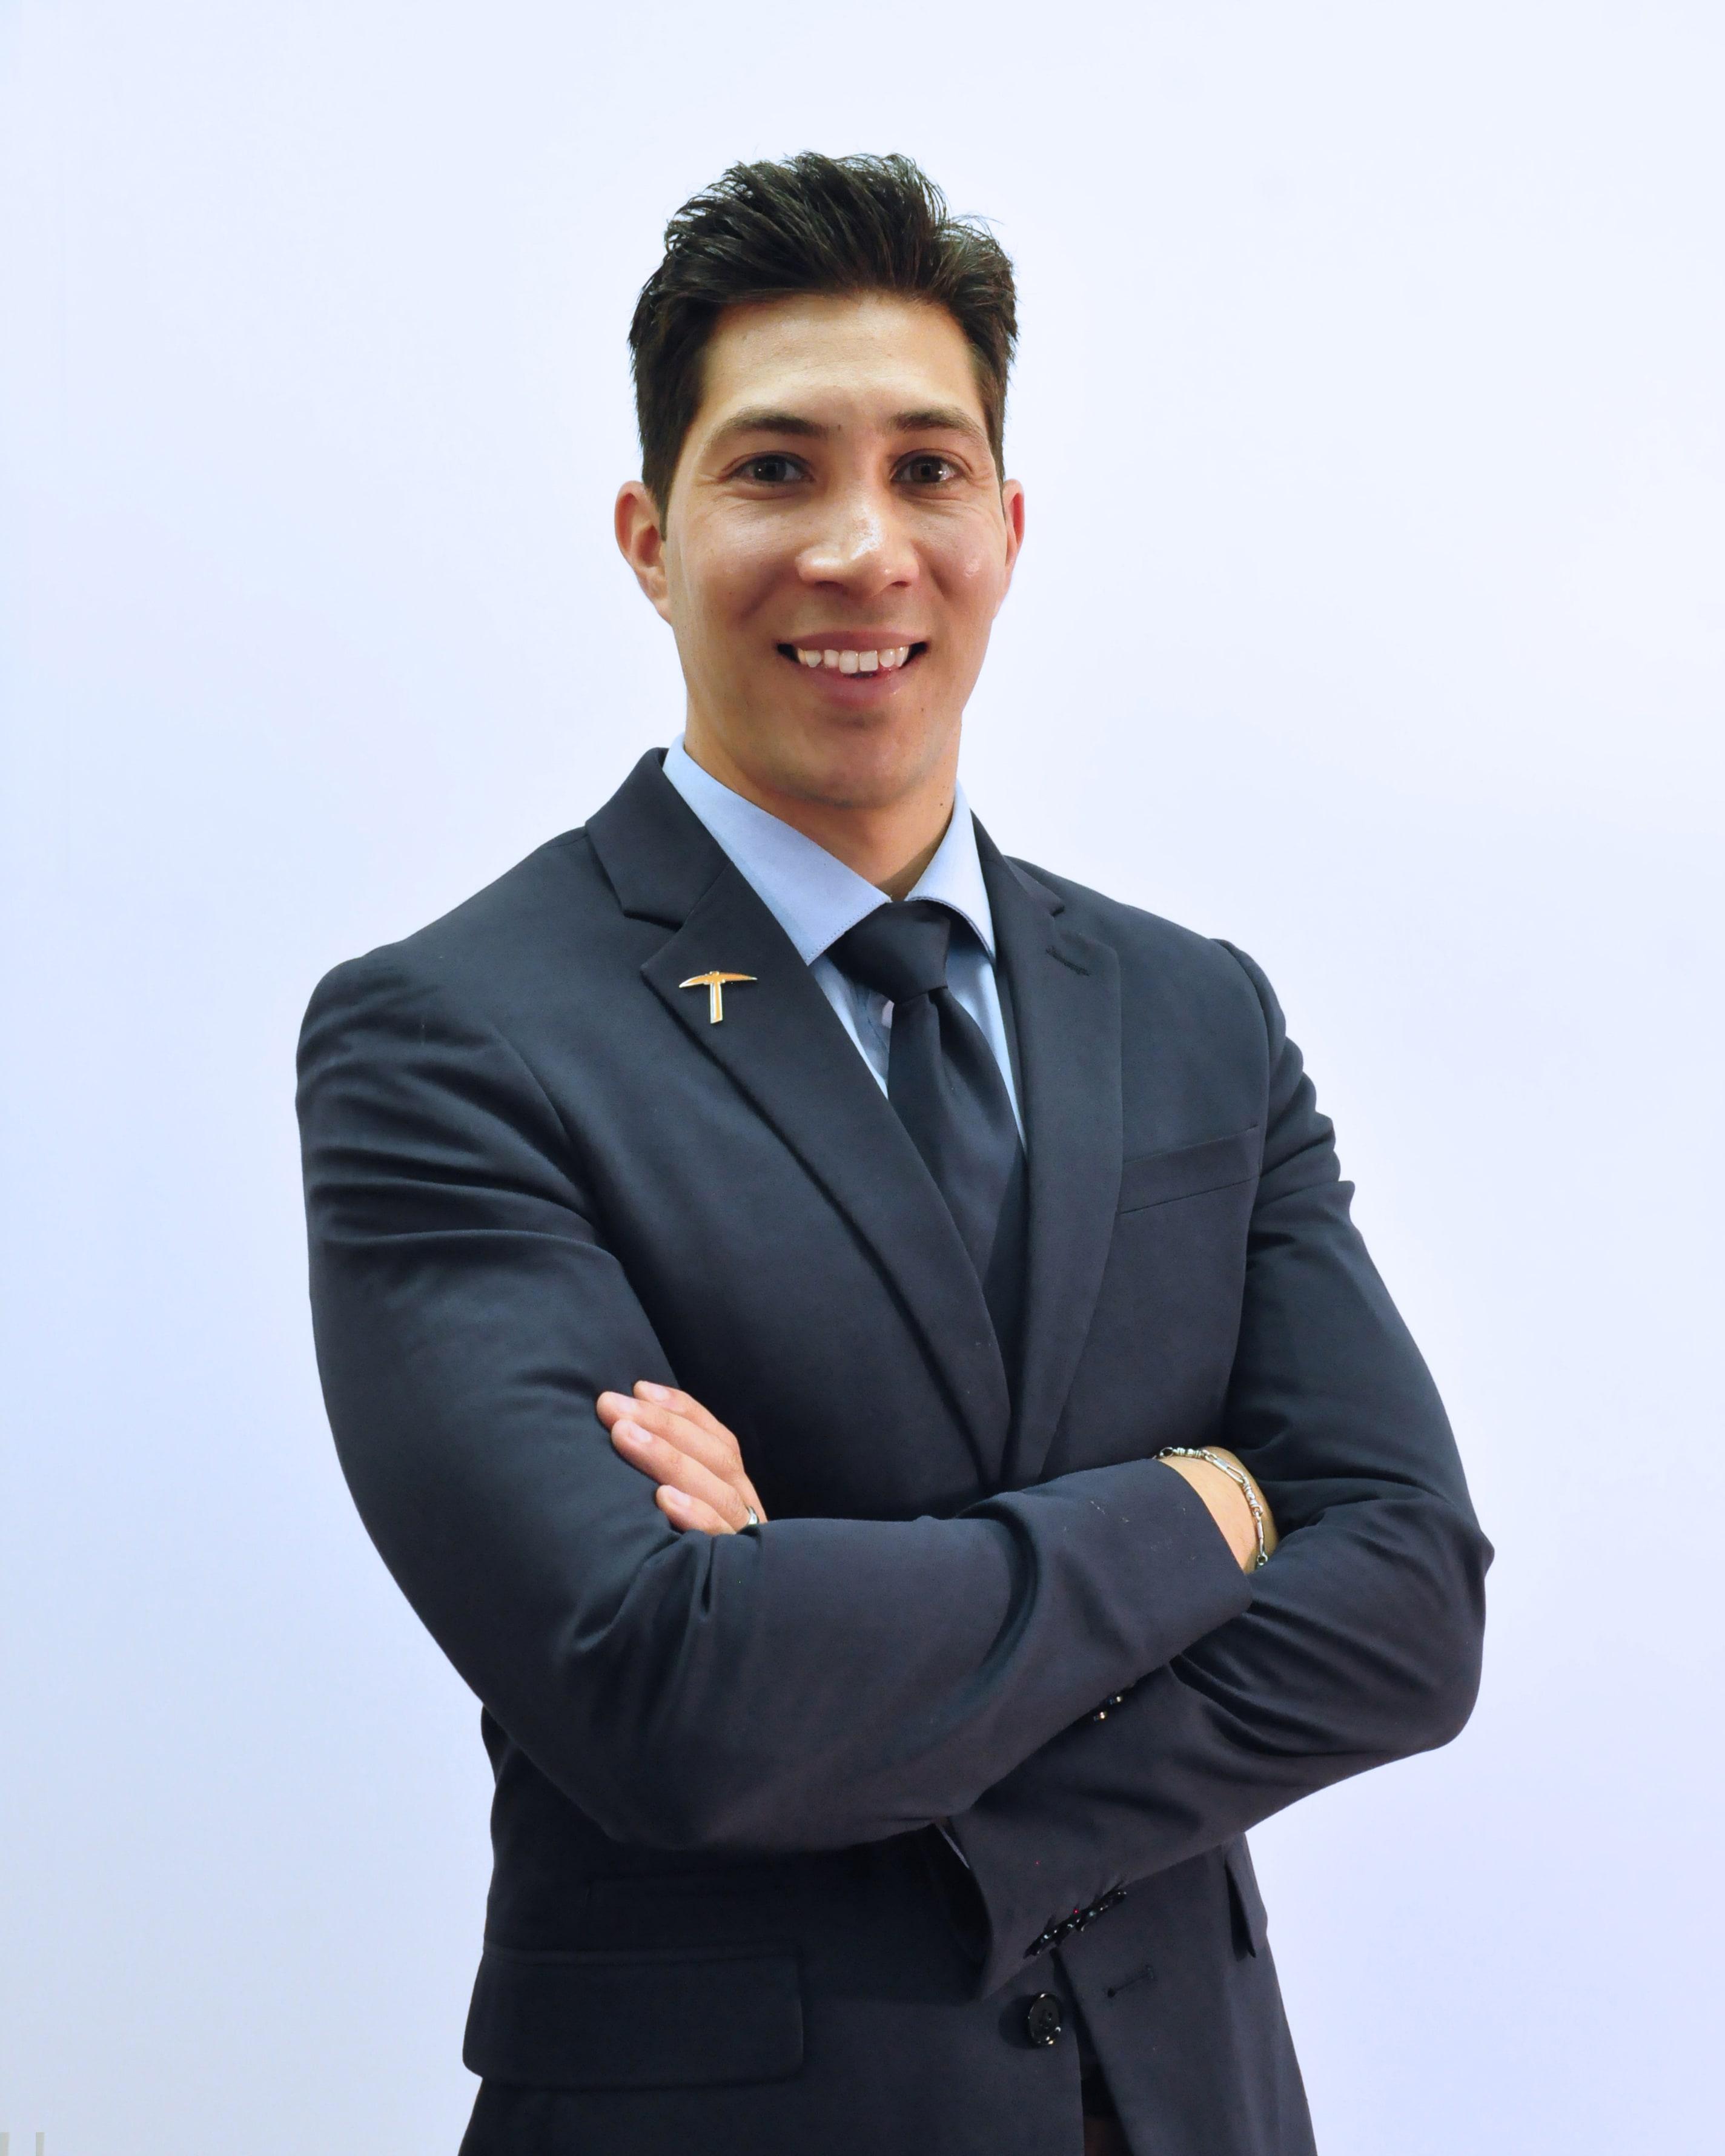 Mick Martinez